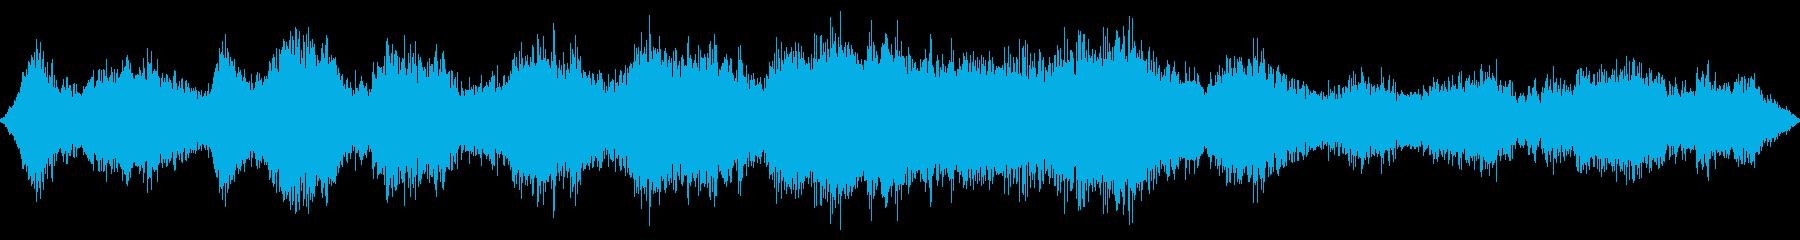 VORTEX WIND:エリー、渦...の再生済みの波形